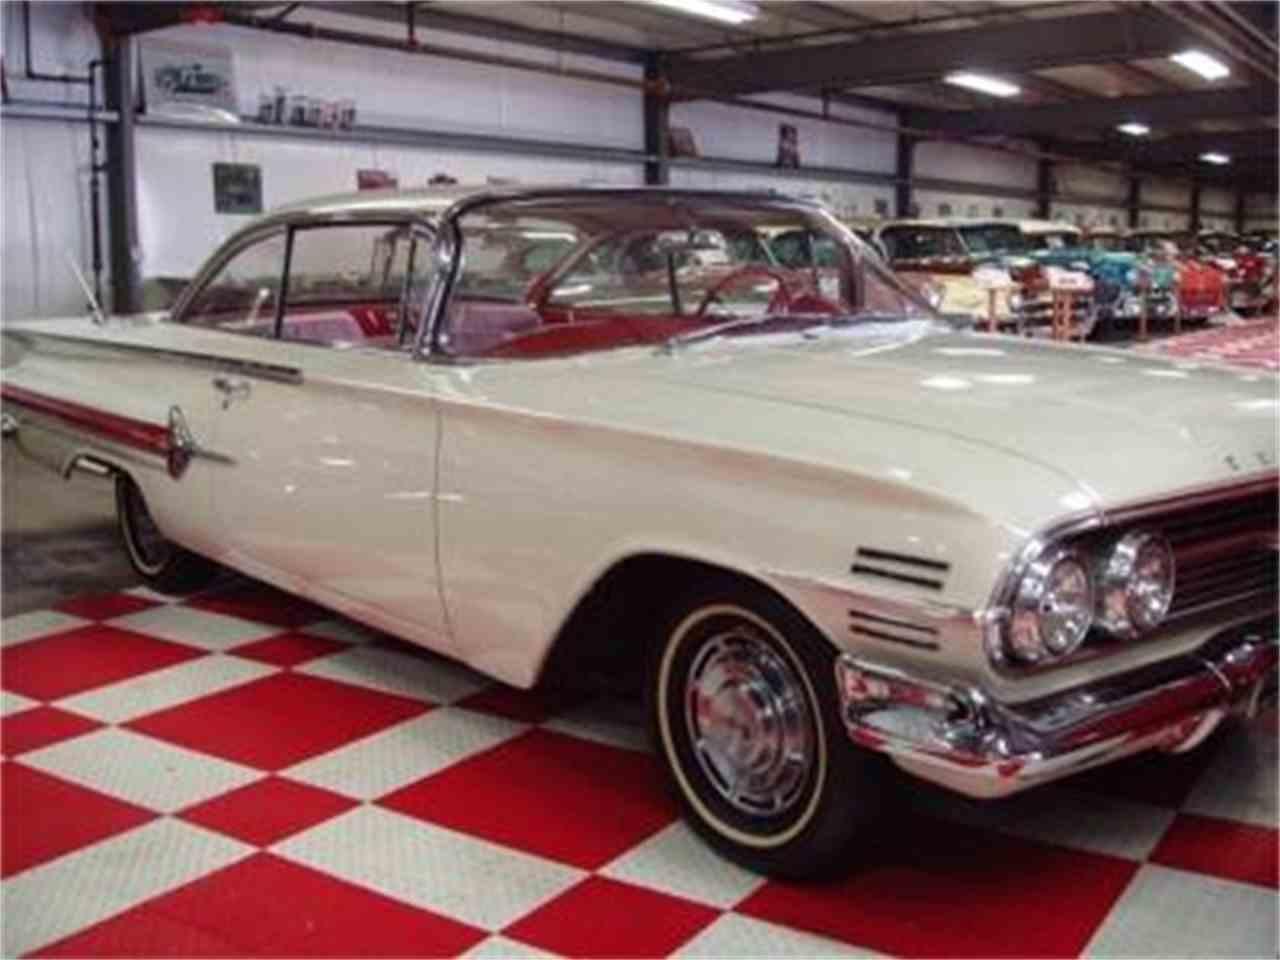 1960 chevrolet impala for sale cc 1044997. Black Bedroom Furniture Sets. Home Design Ideas